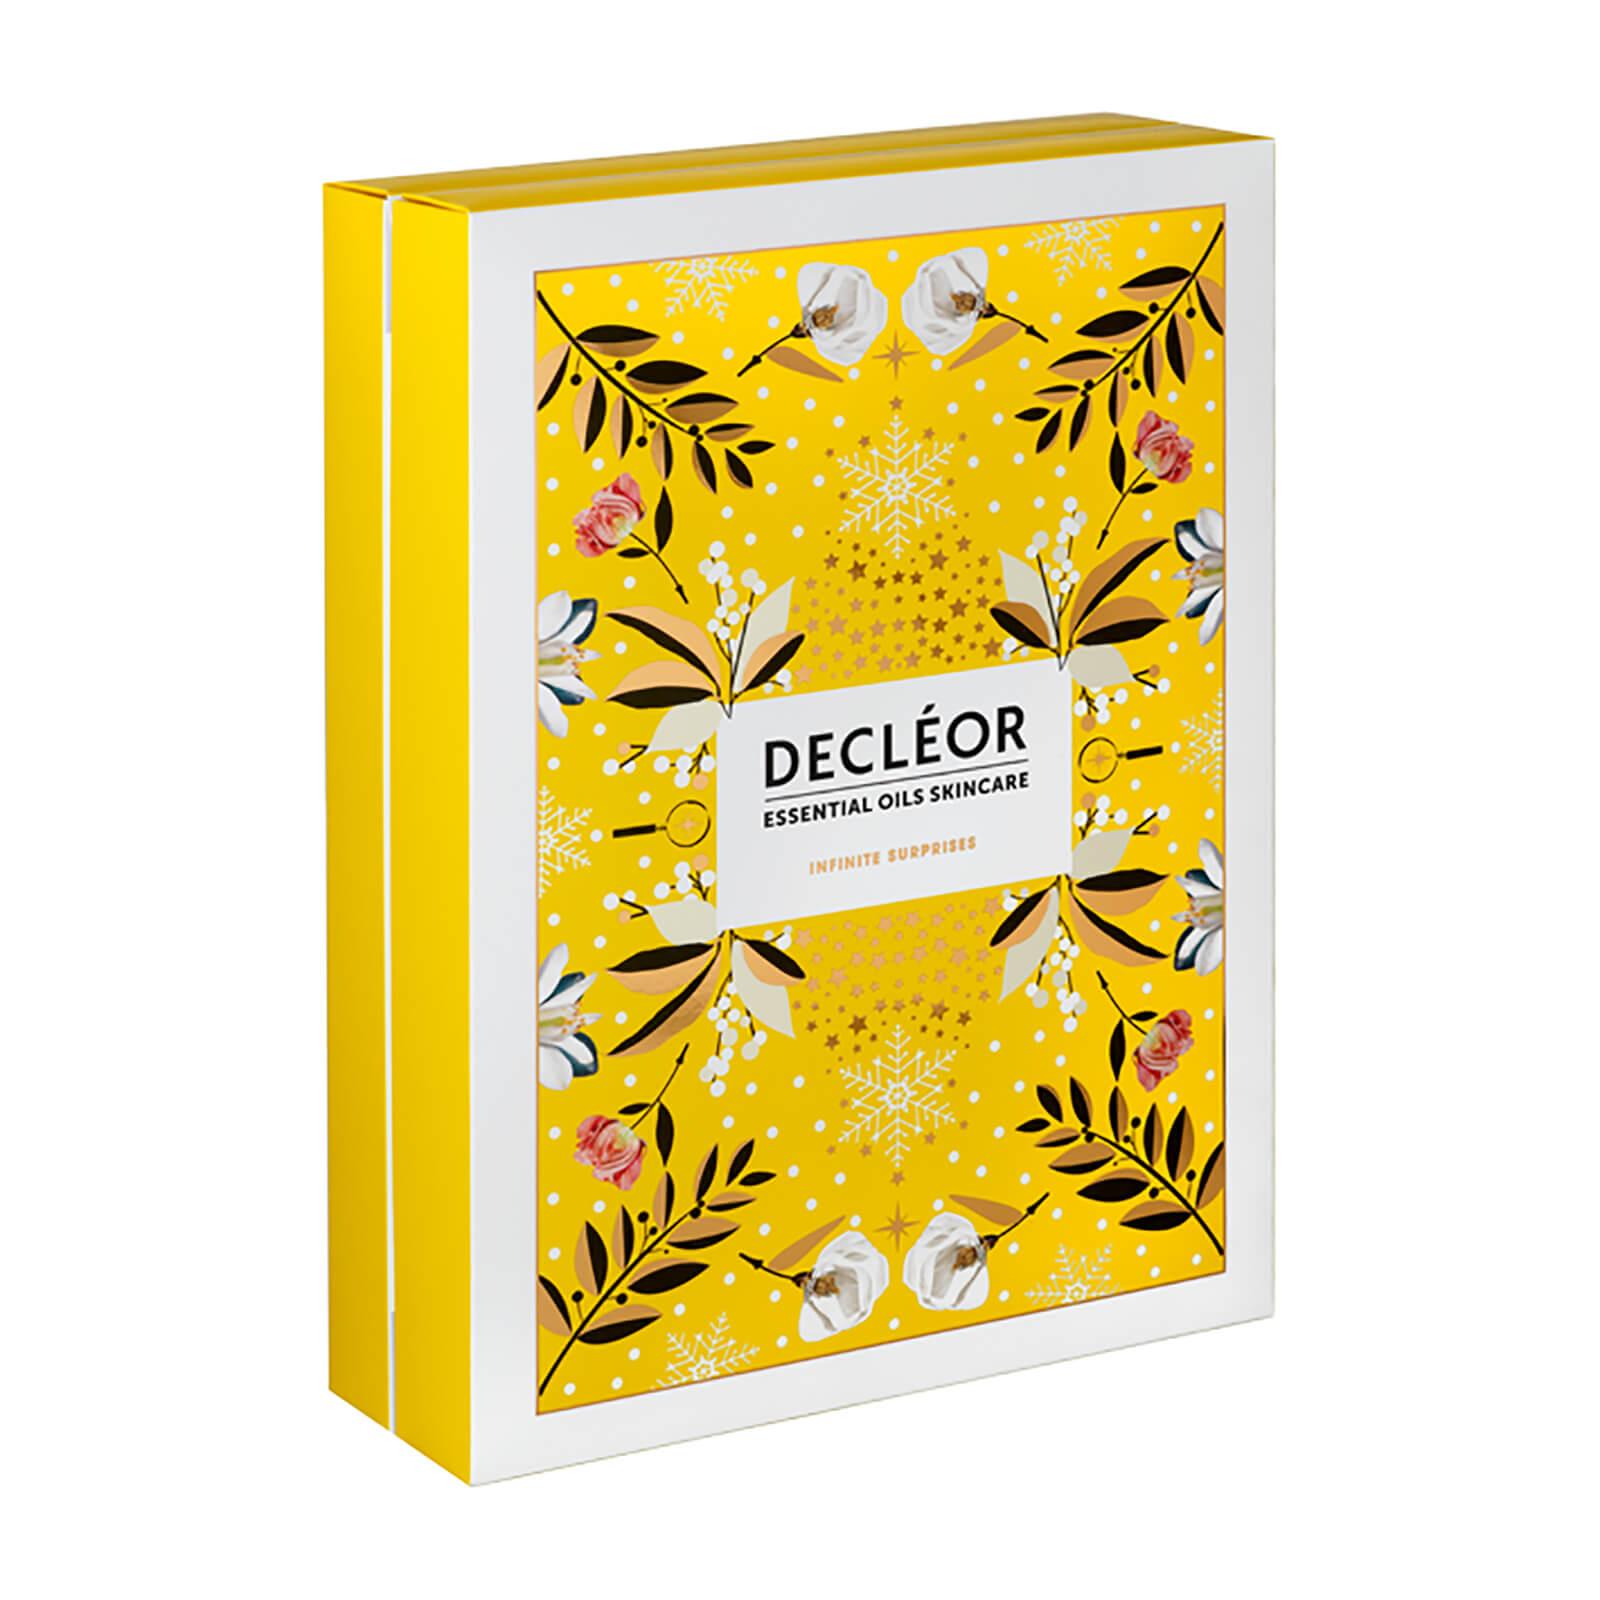 decleor infinite surprises advent calendar 2019 contents. Black Bedroom Furniture Sets. Home Design Ideas